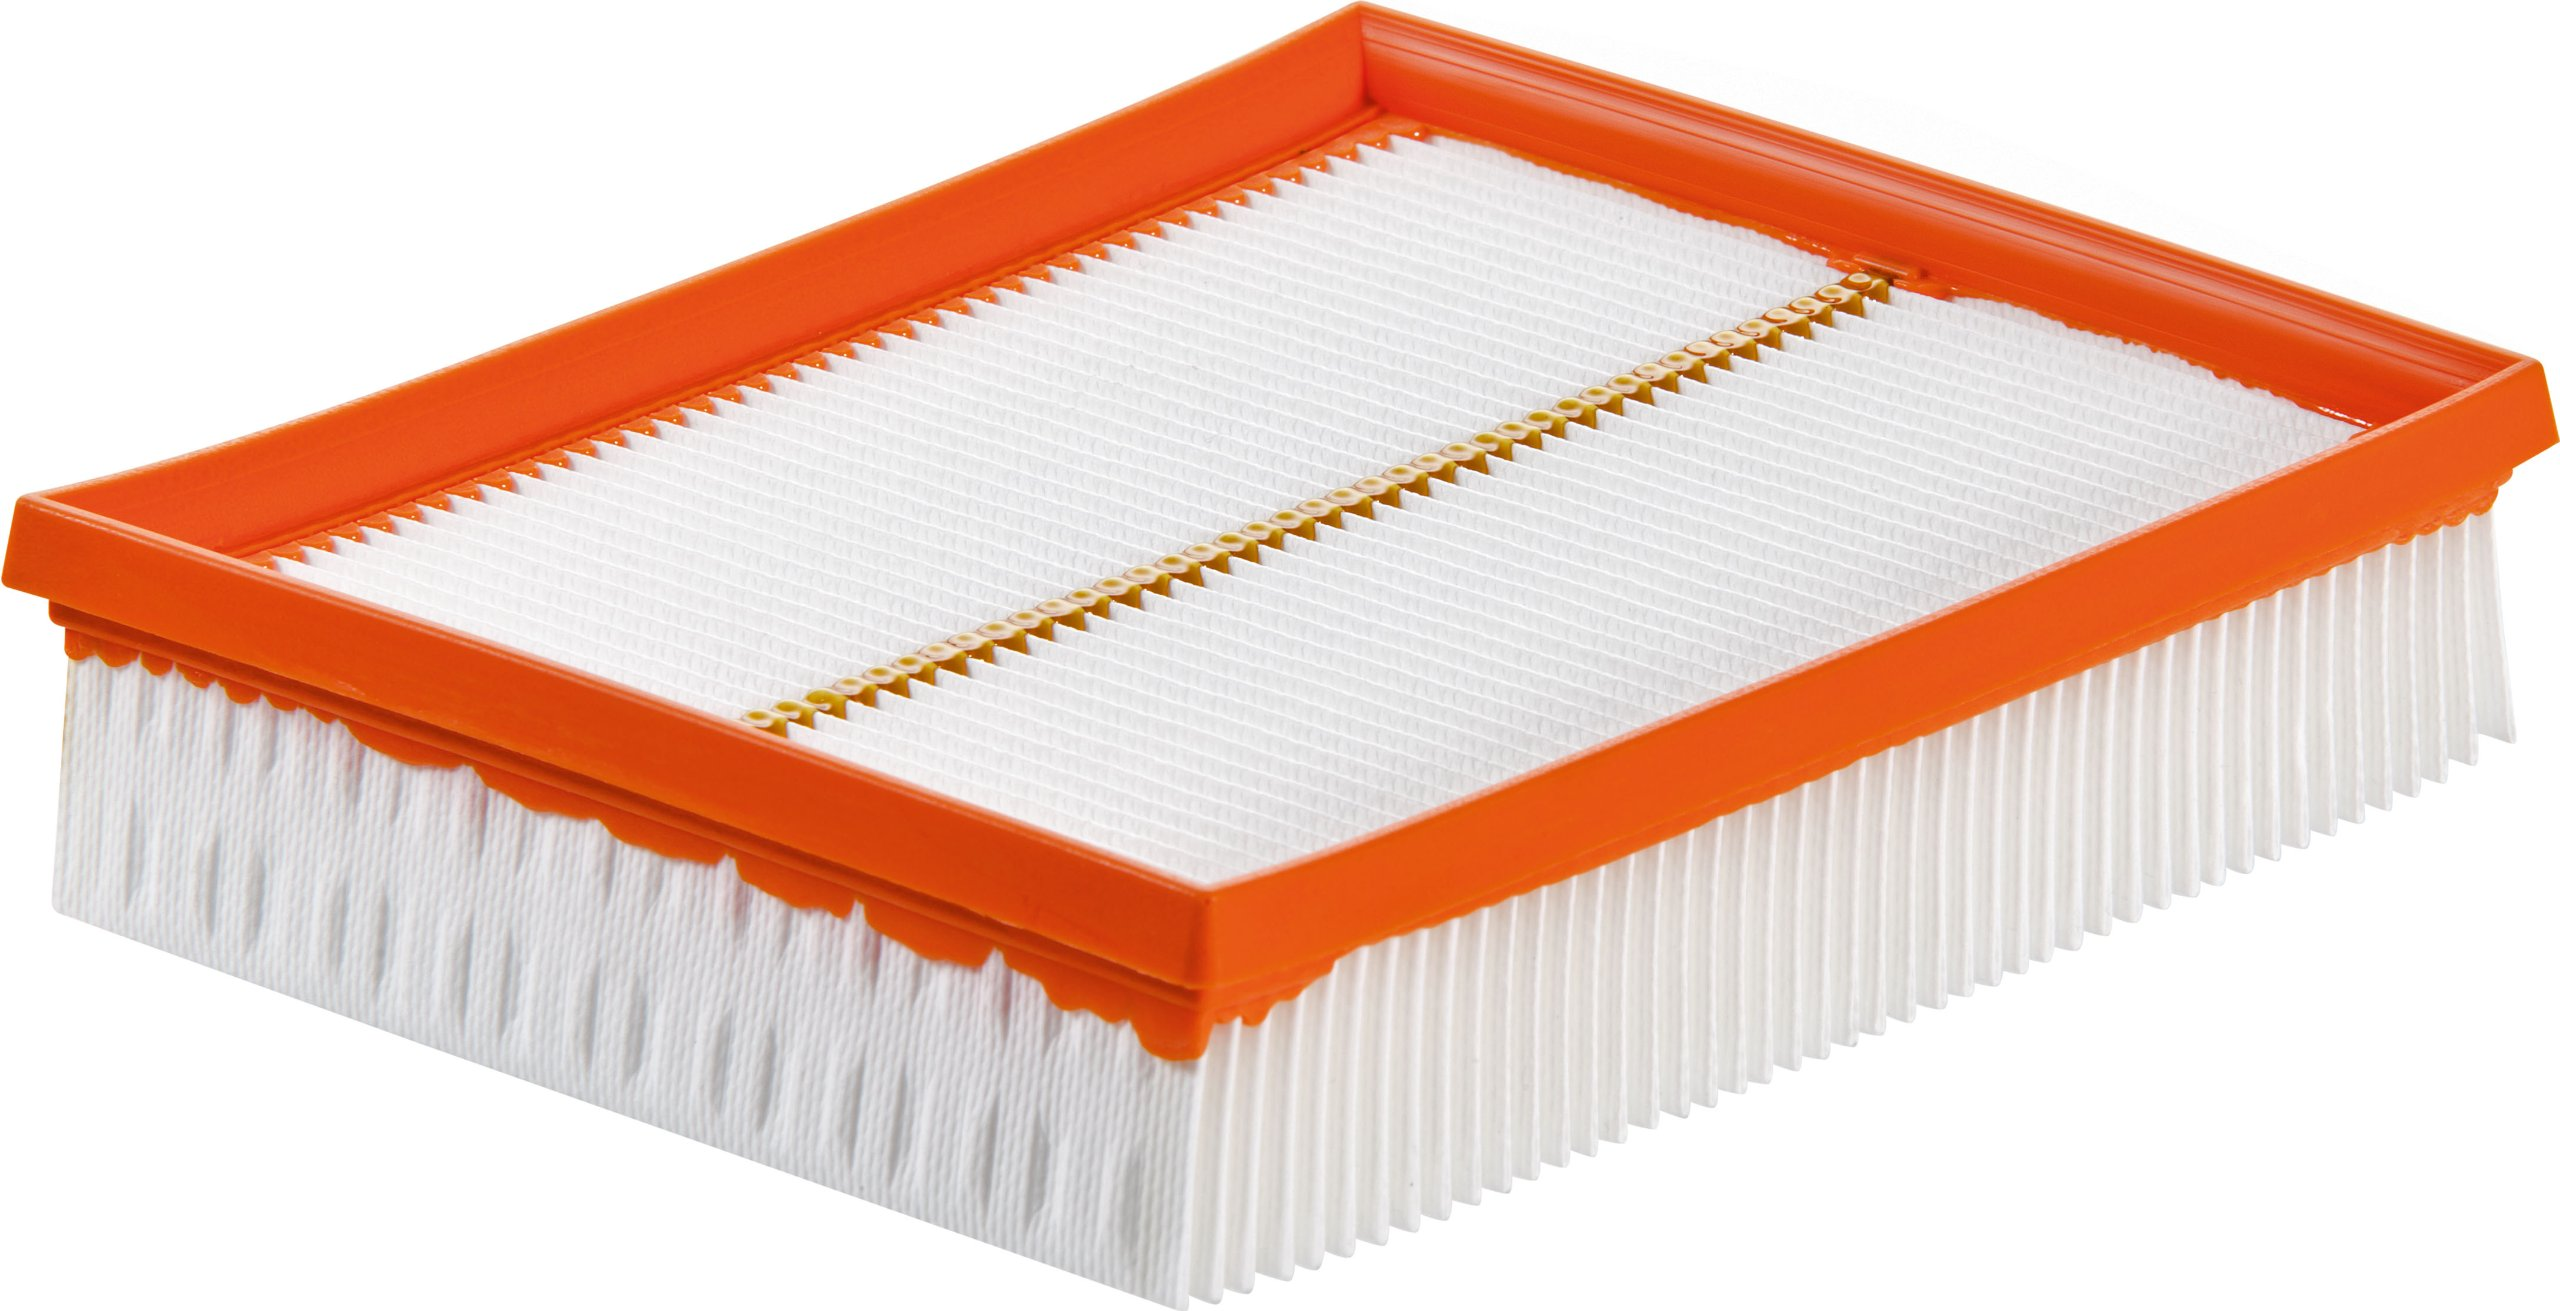 Festool 496172 High-Performance Filter by Festool